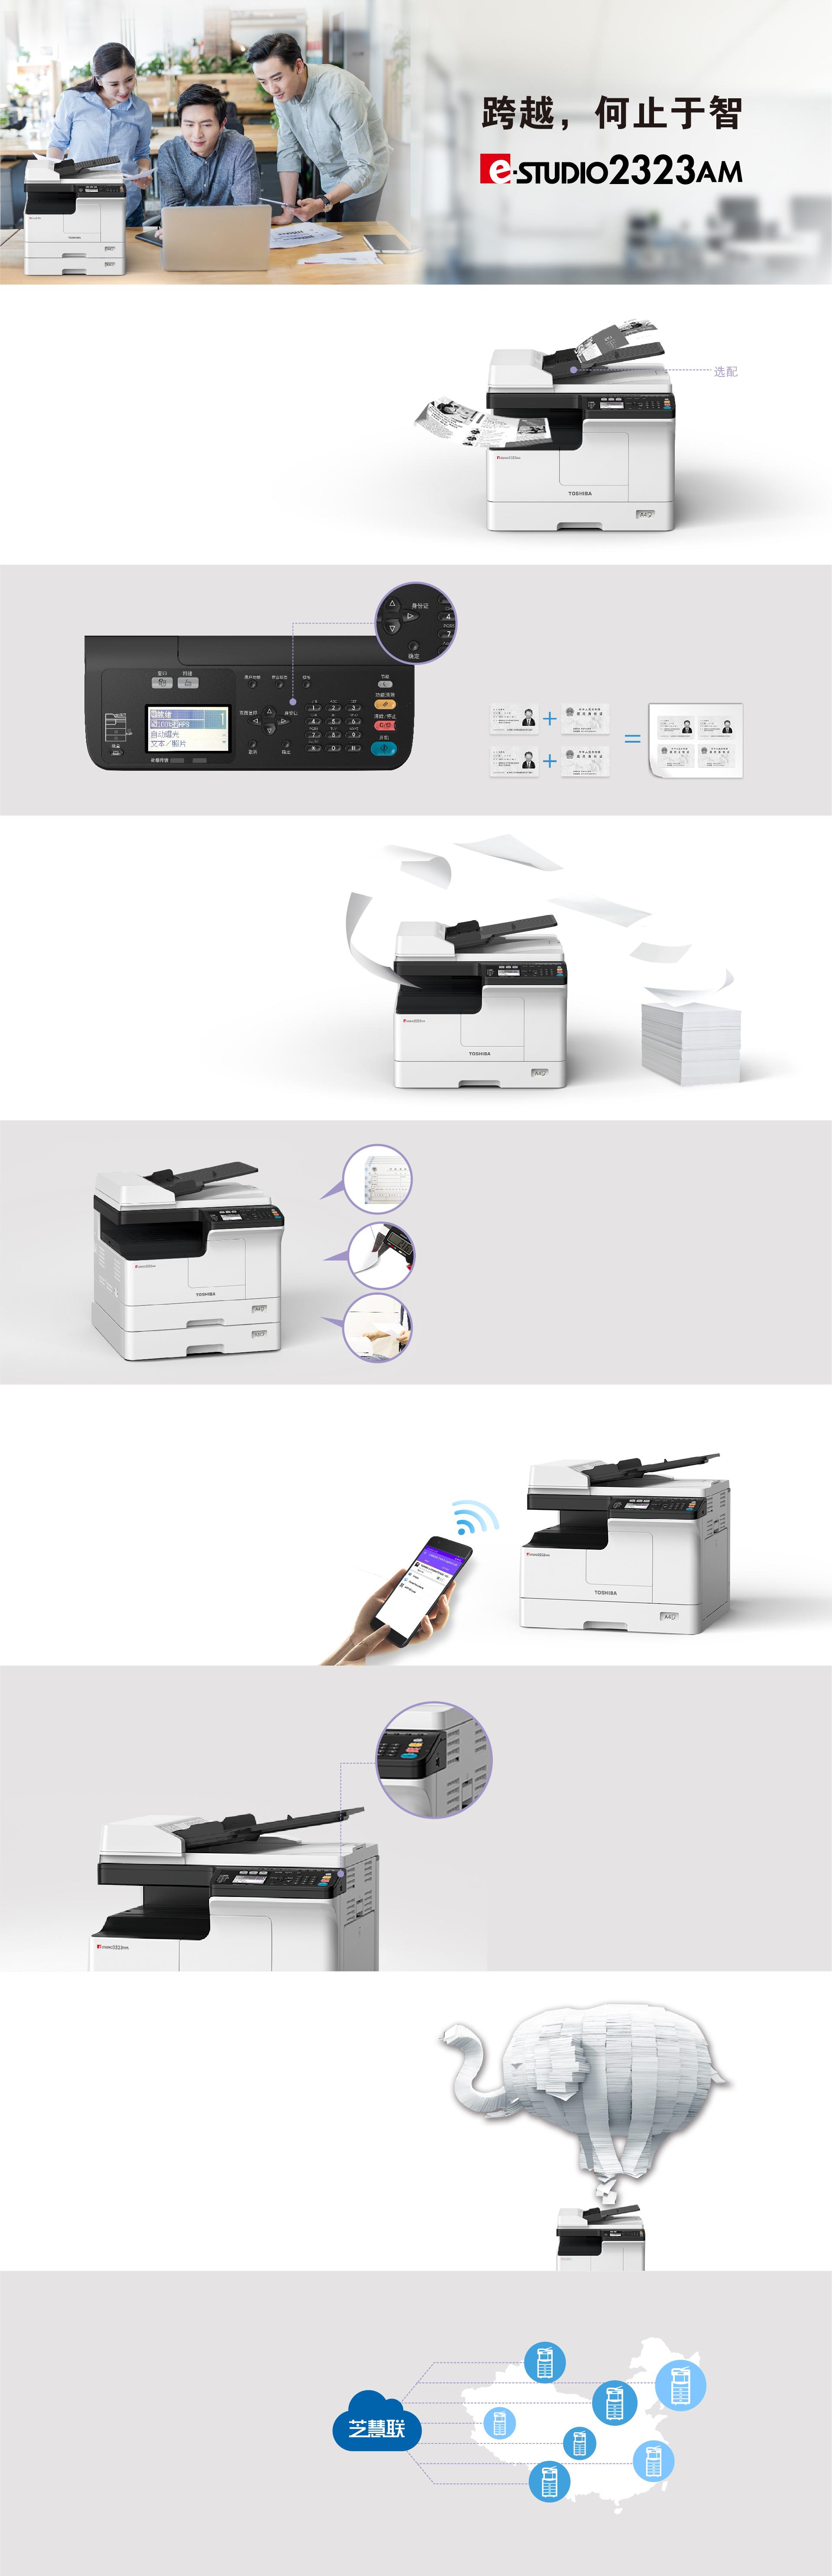 Toshiba-digital-photocopier-machine-duplex-network-e-studio-2323am-series-price-bd